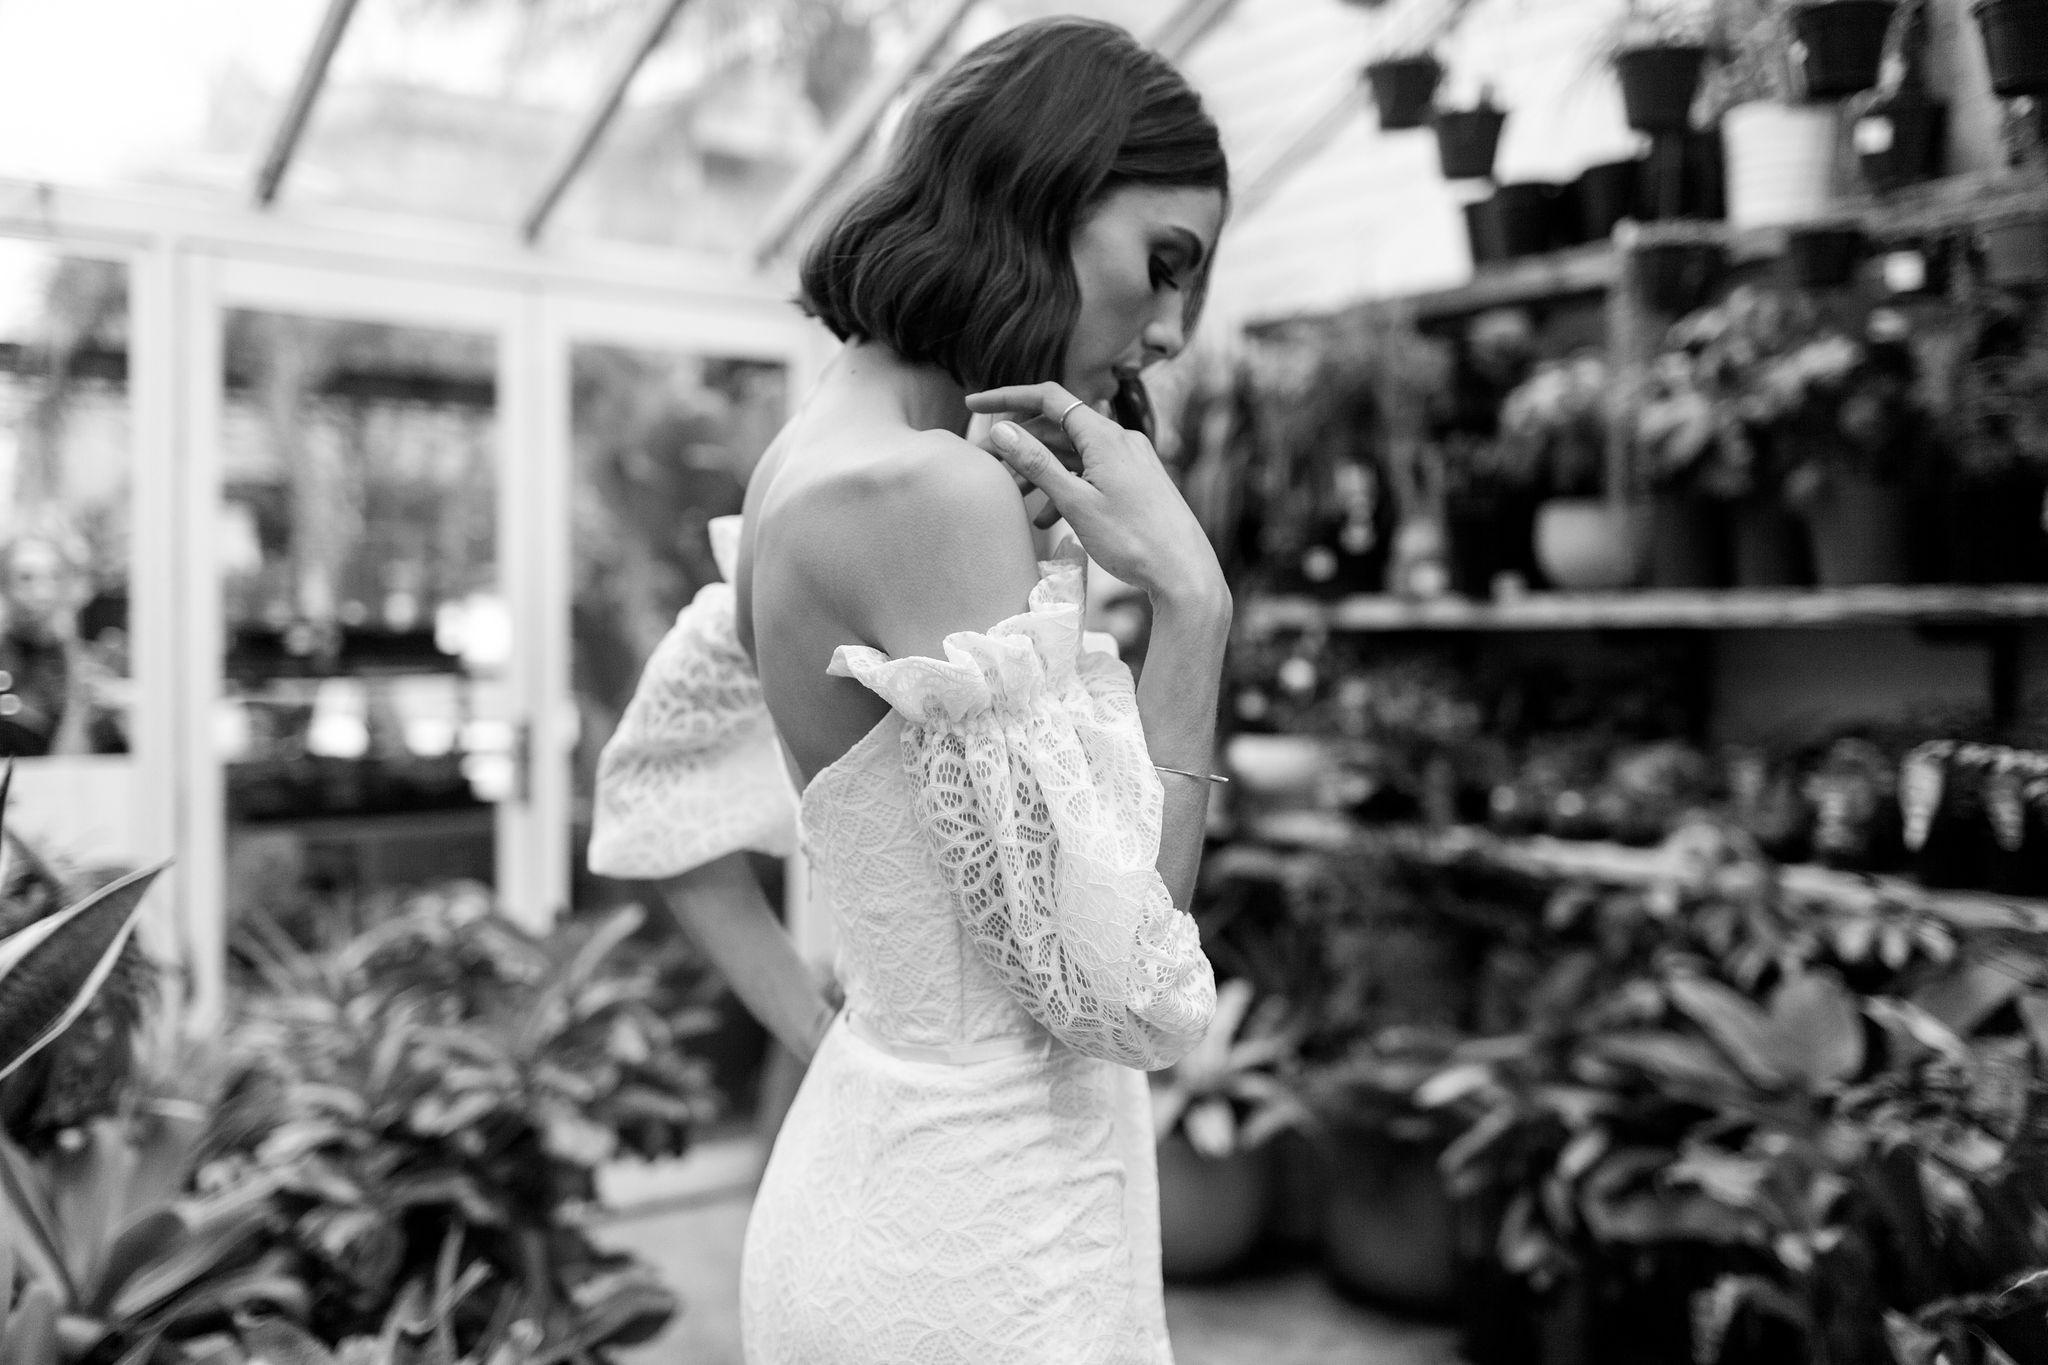 Vivienne_KarenWillisHolmes_GlasshausHR32.jpg